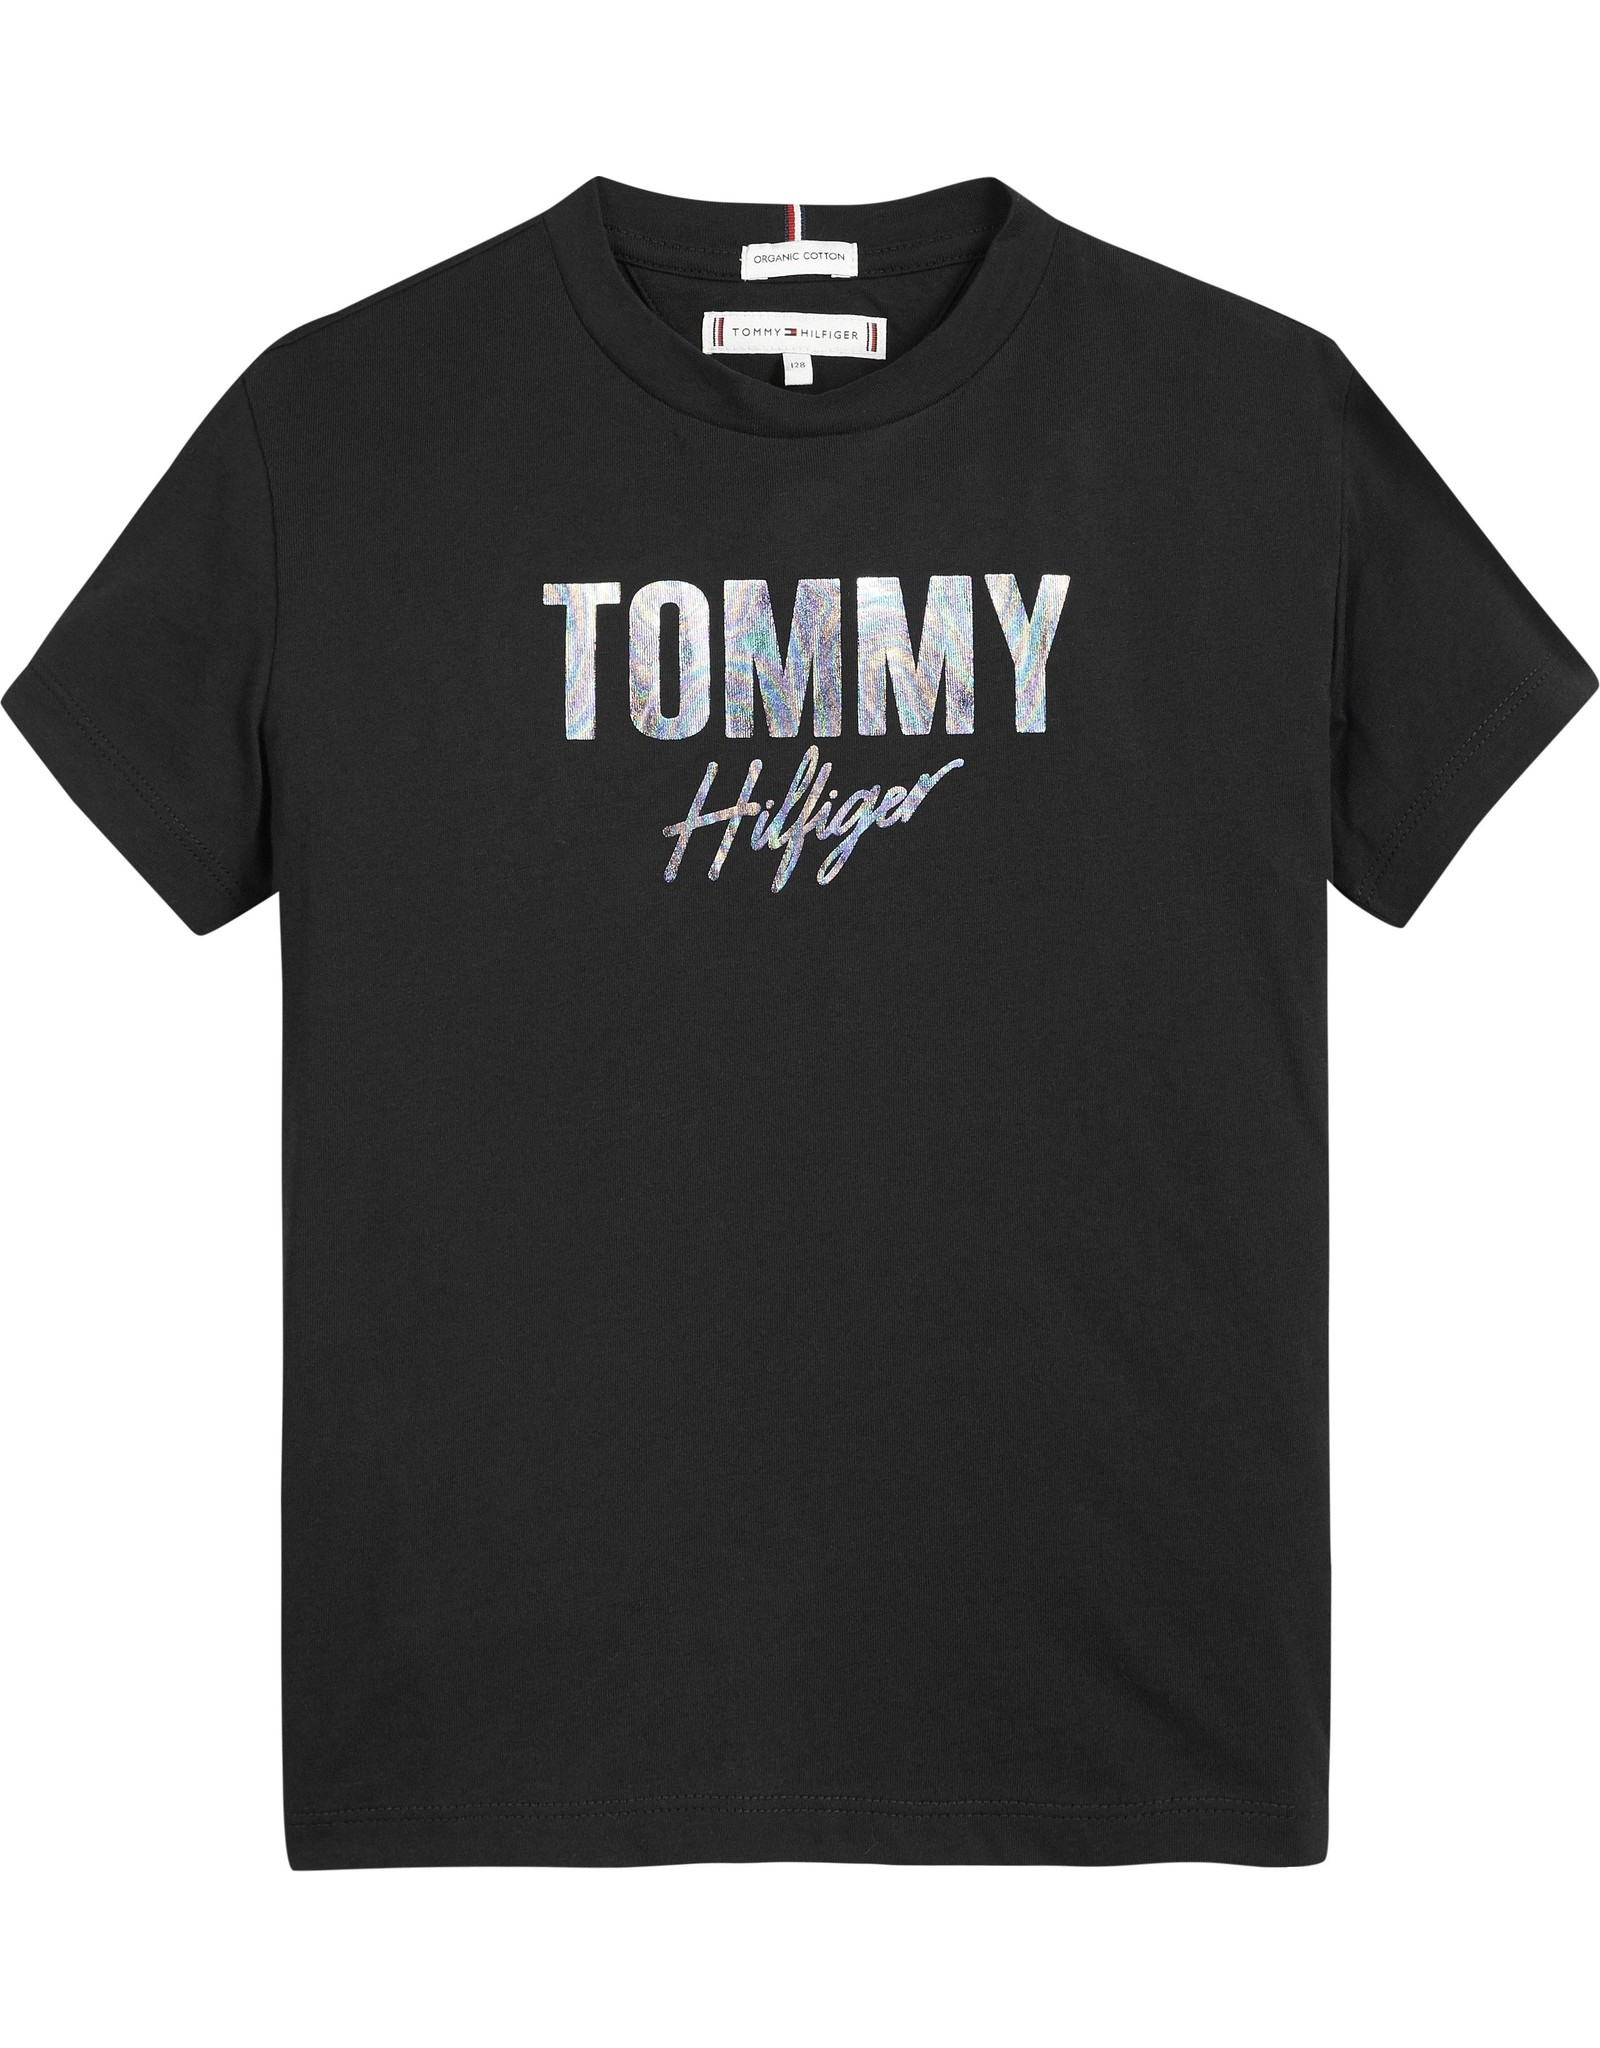 Tommy Hilfiger 5700 T-Shirt